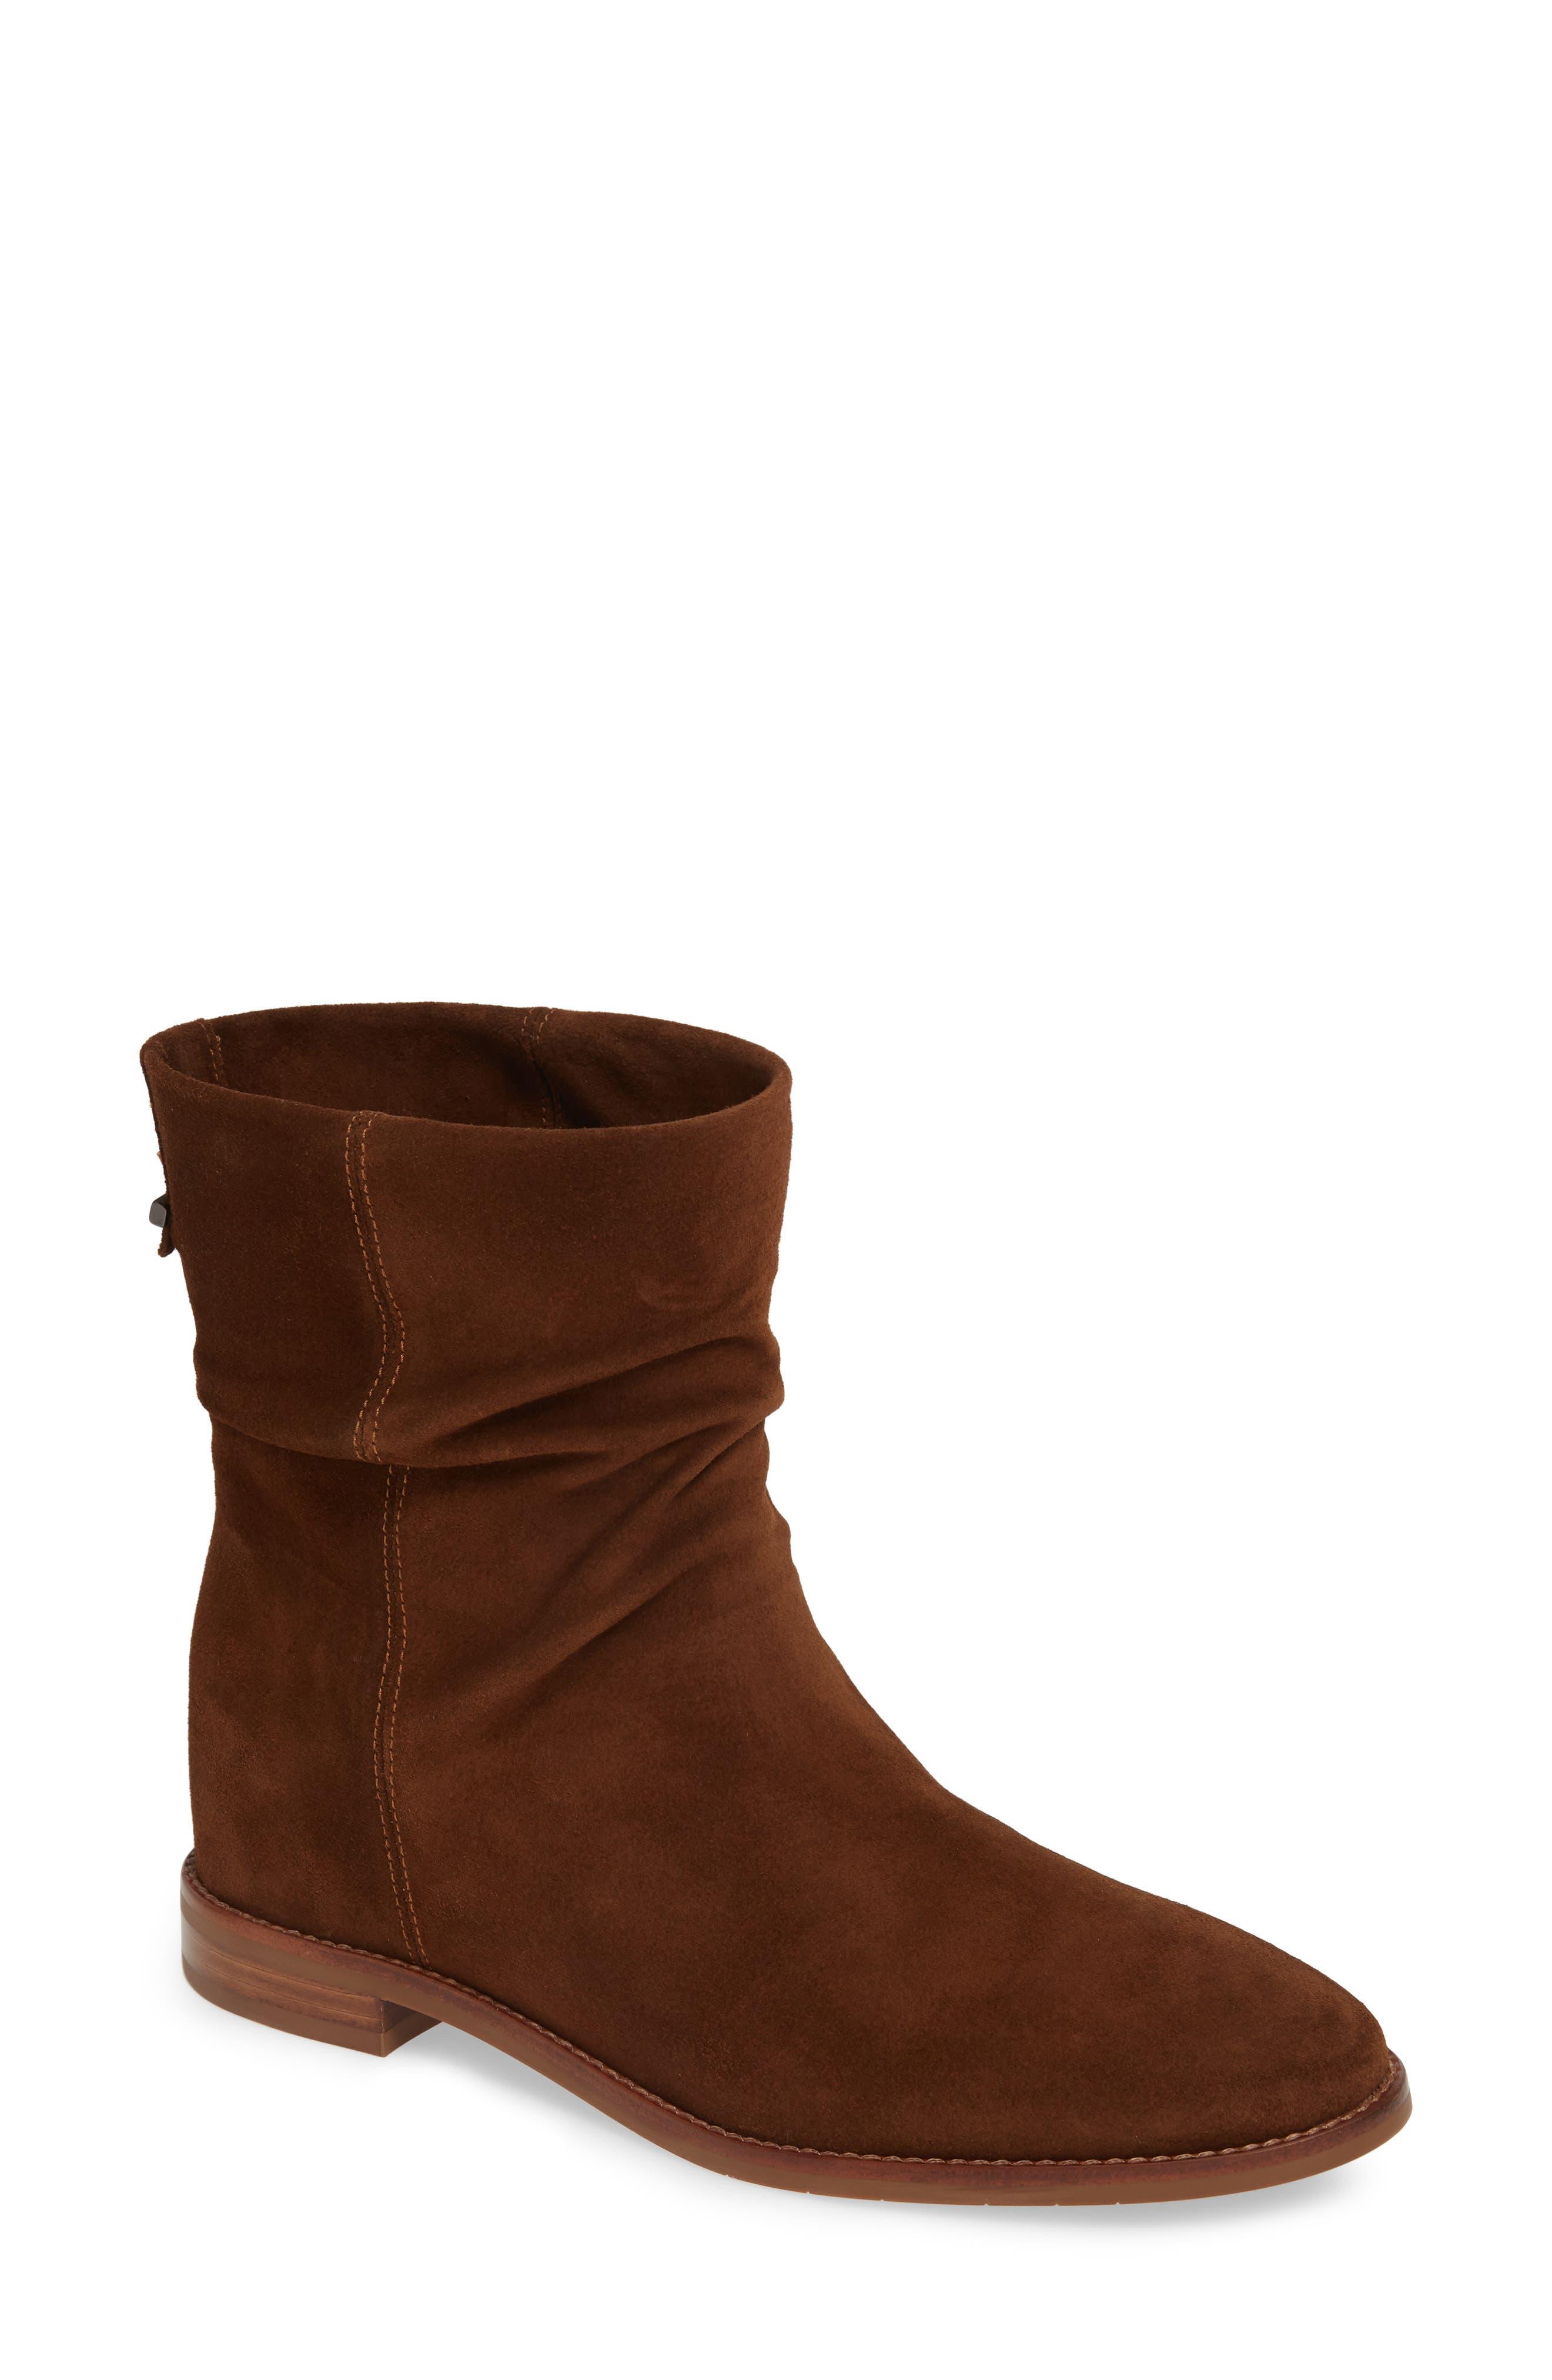 Aquatalia Caleigh Weatherproof Boot, Brown